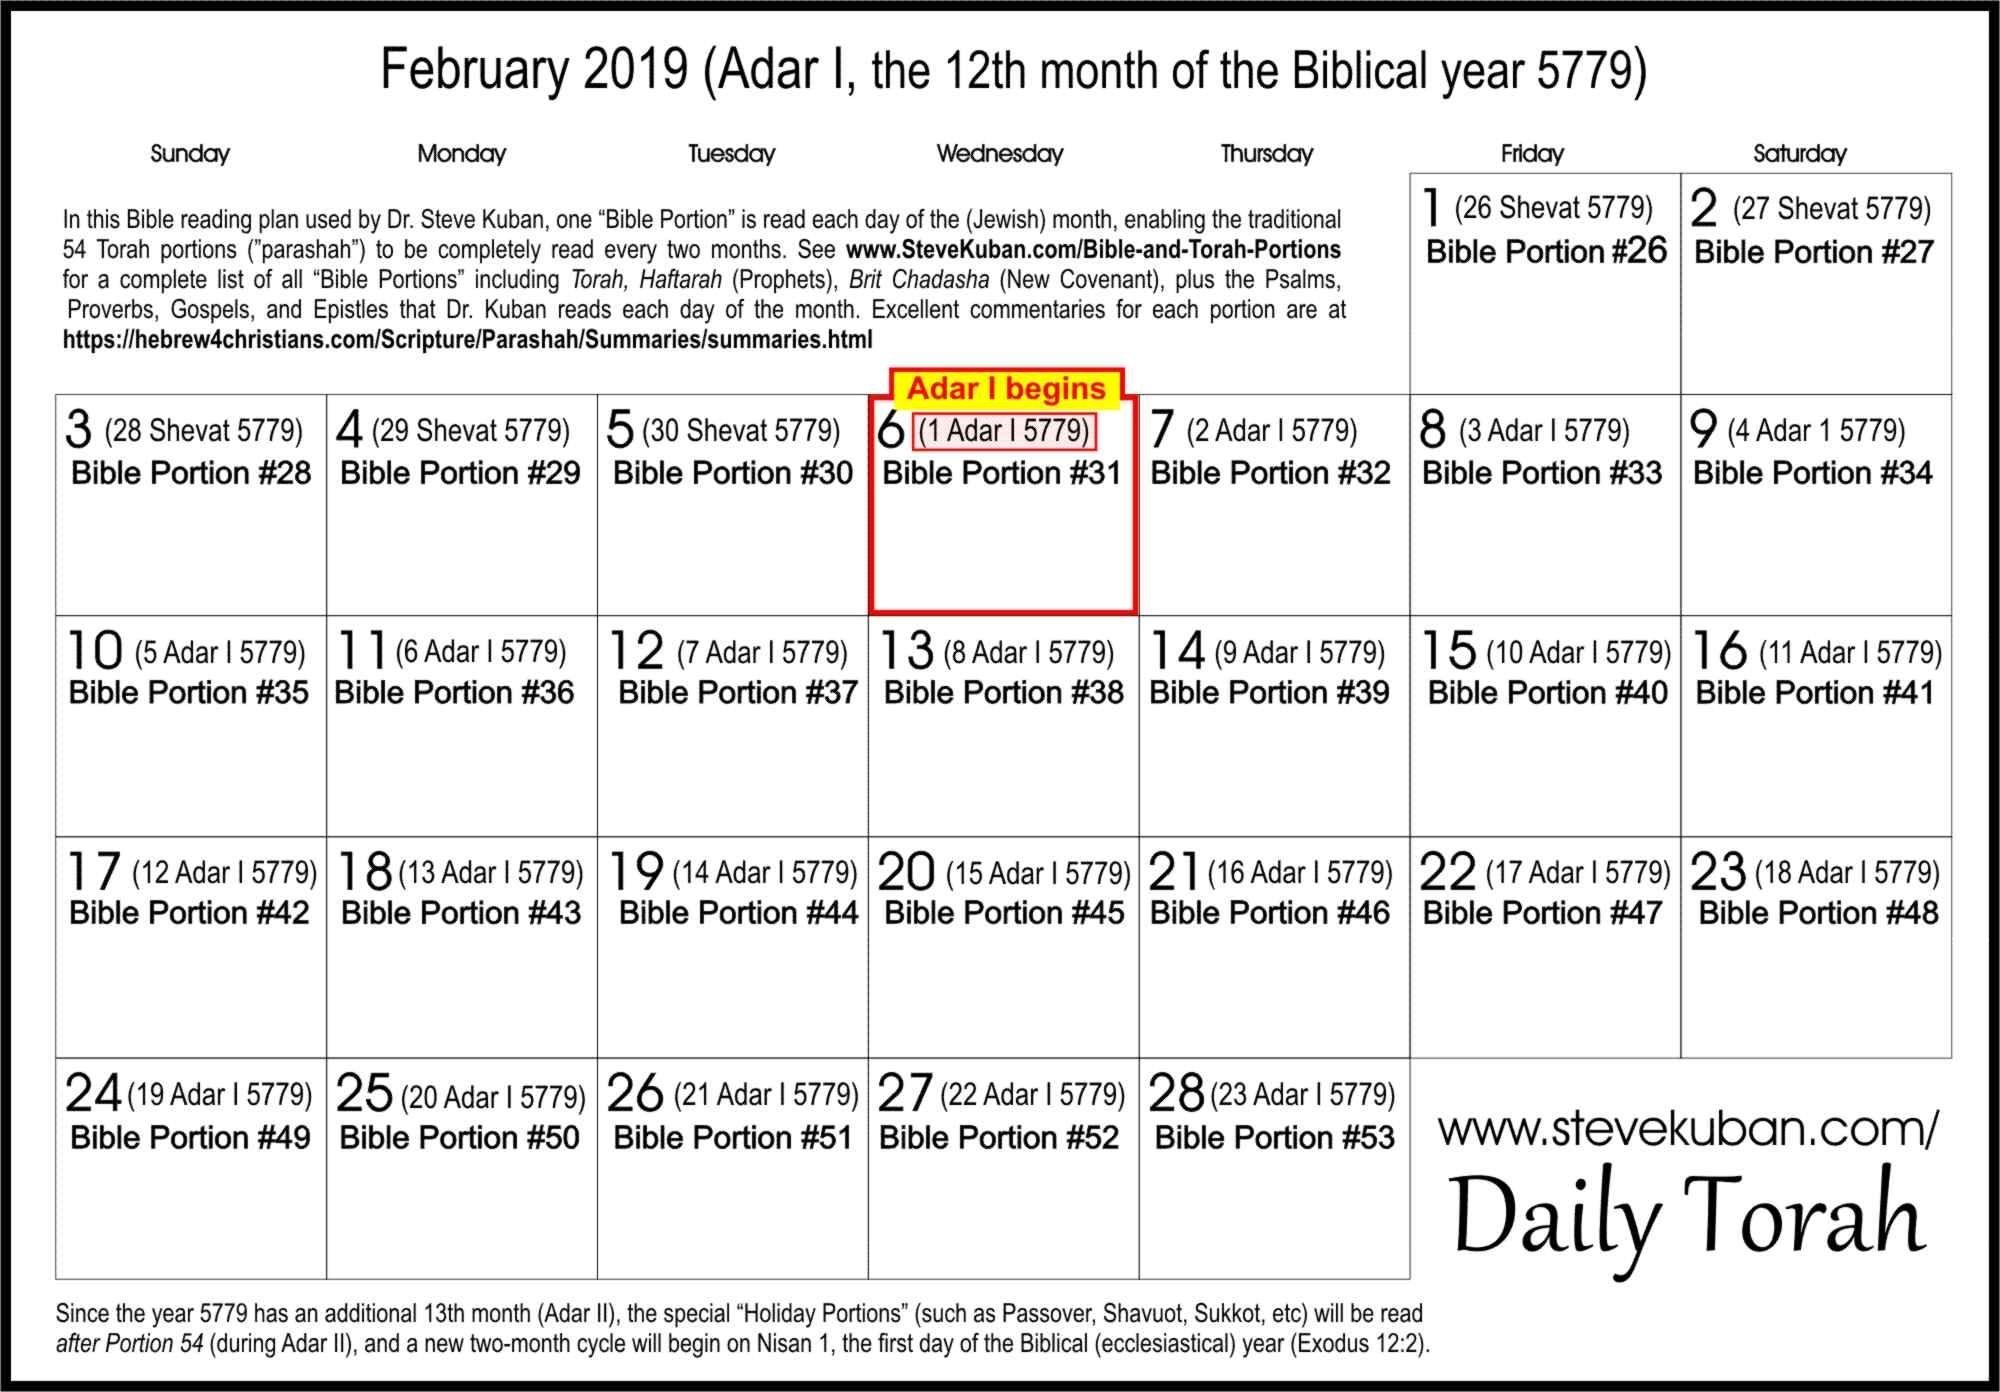 Steve Kuban - Daily Torah in Weekly Torah Reading Portions Calendar